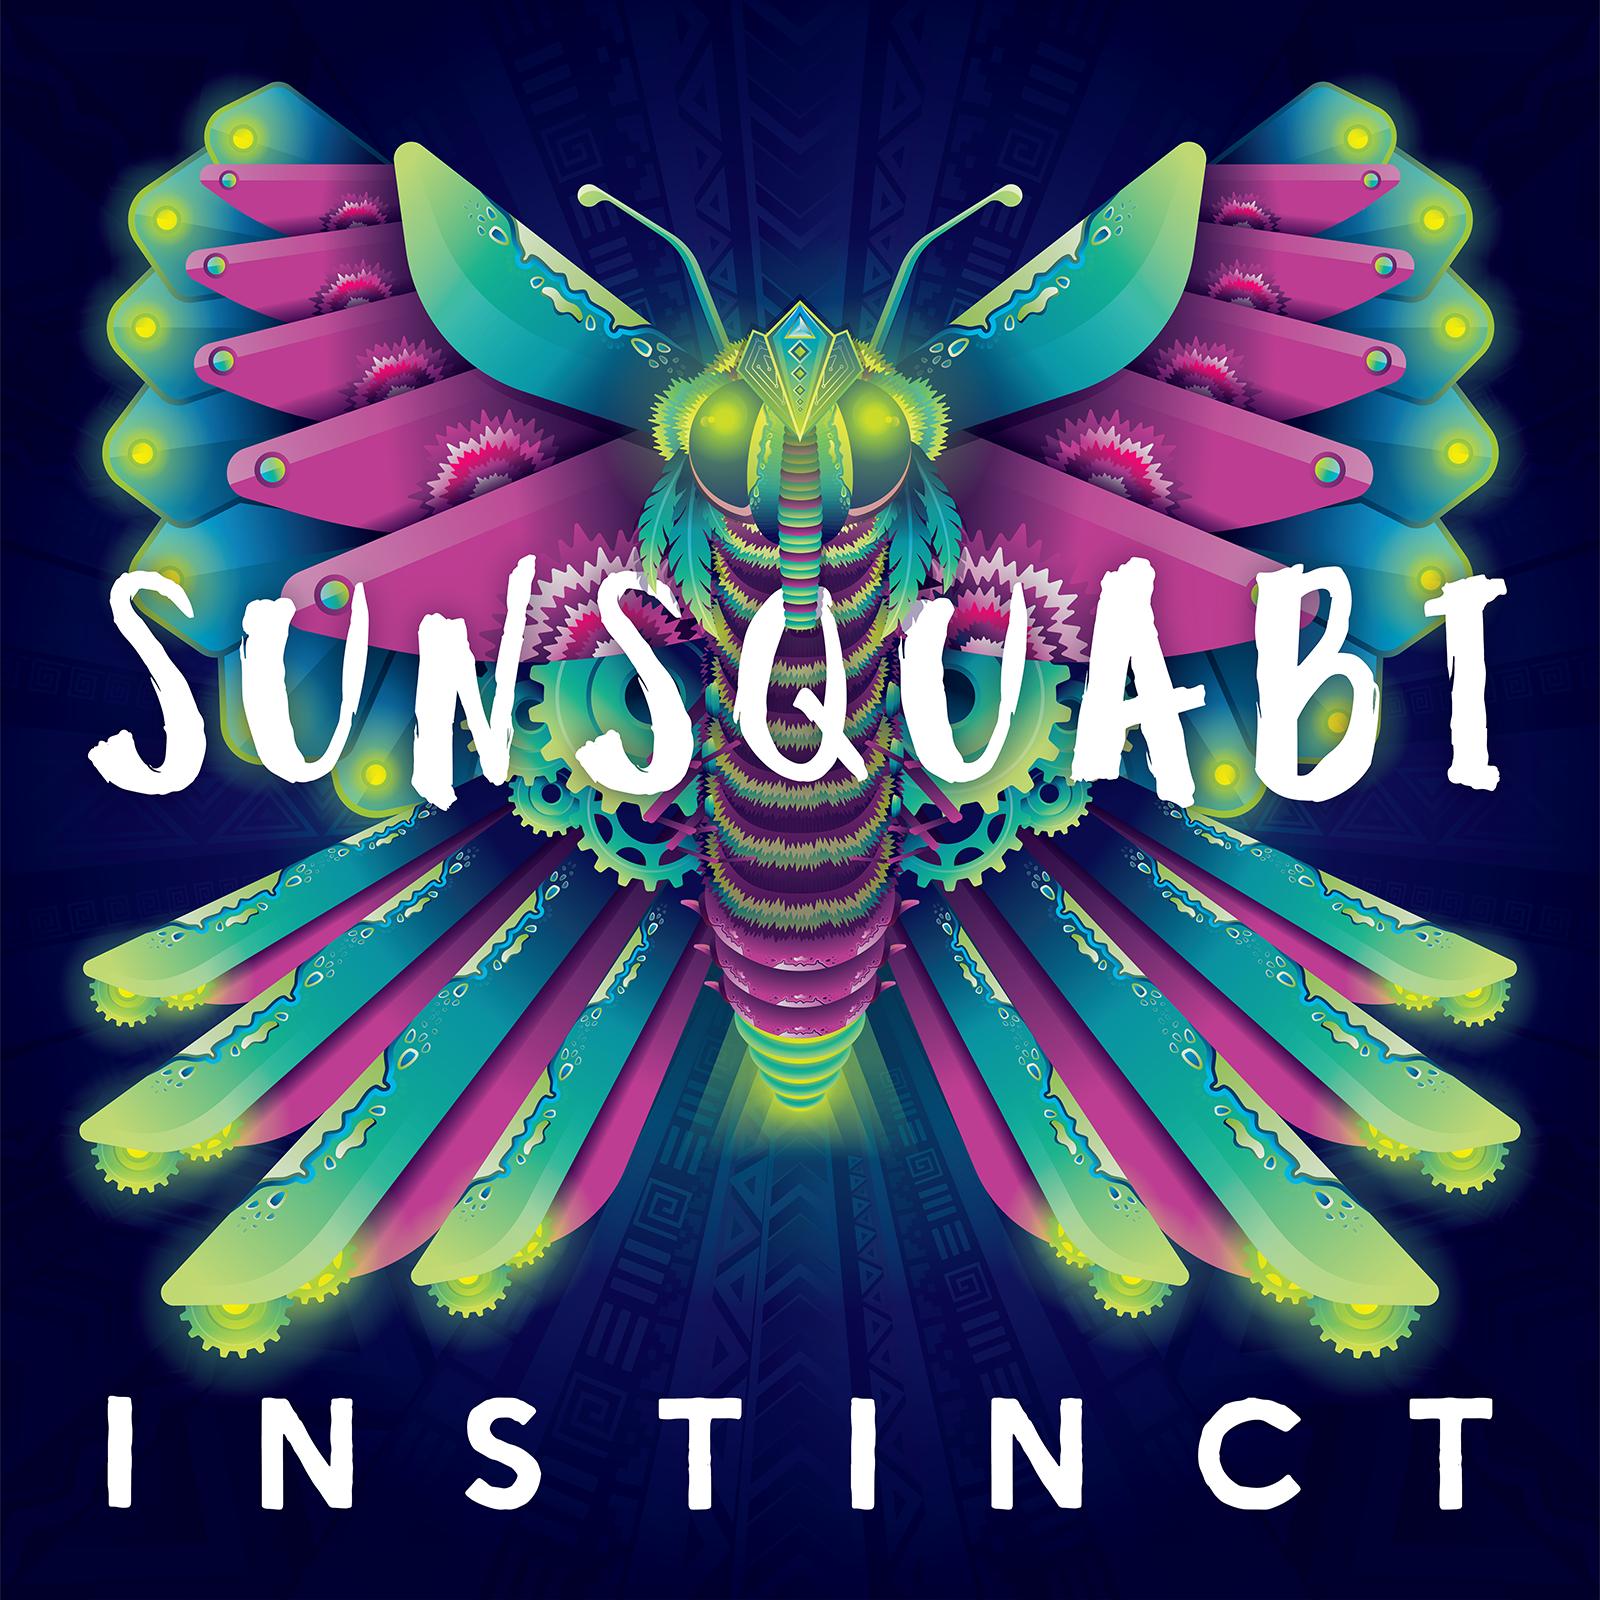 'Instinct' is available now! - Listen/DownloadVinyl Pre-Order